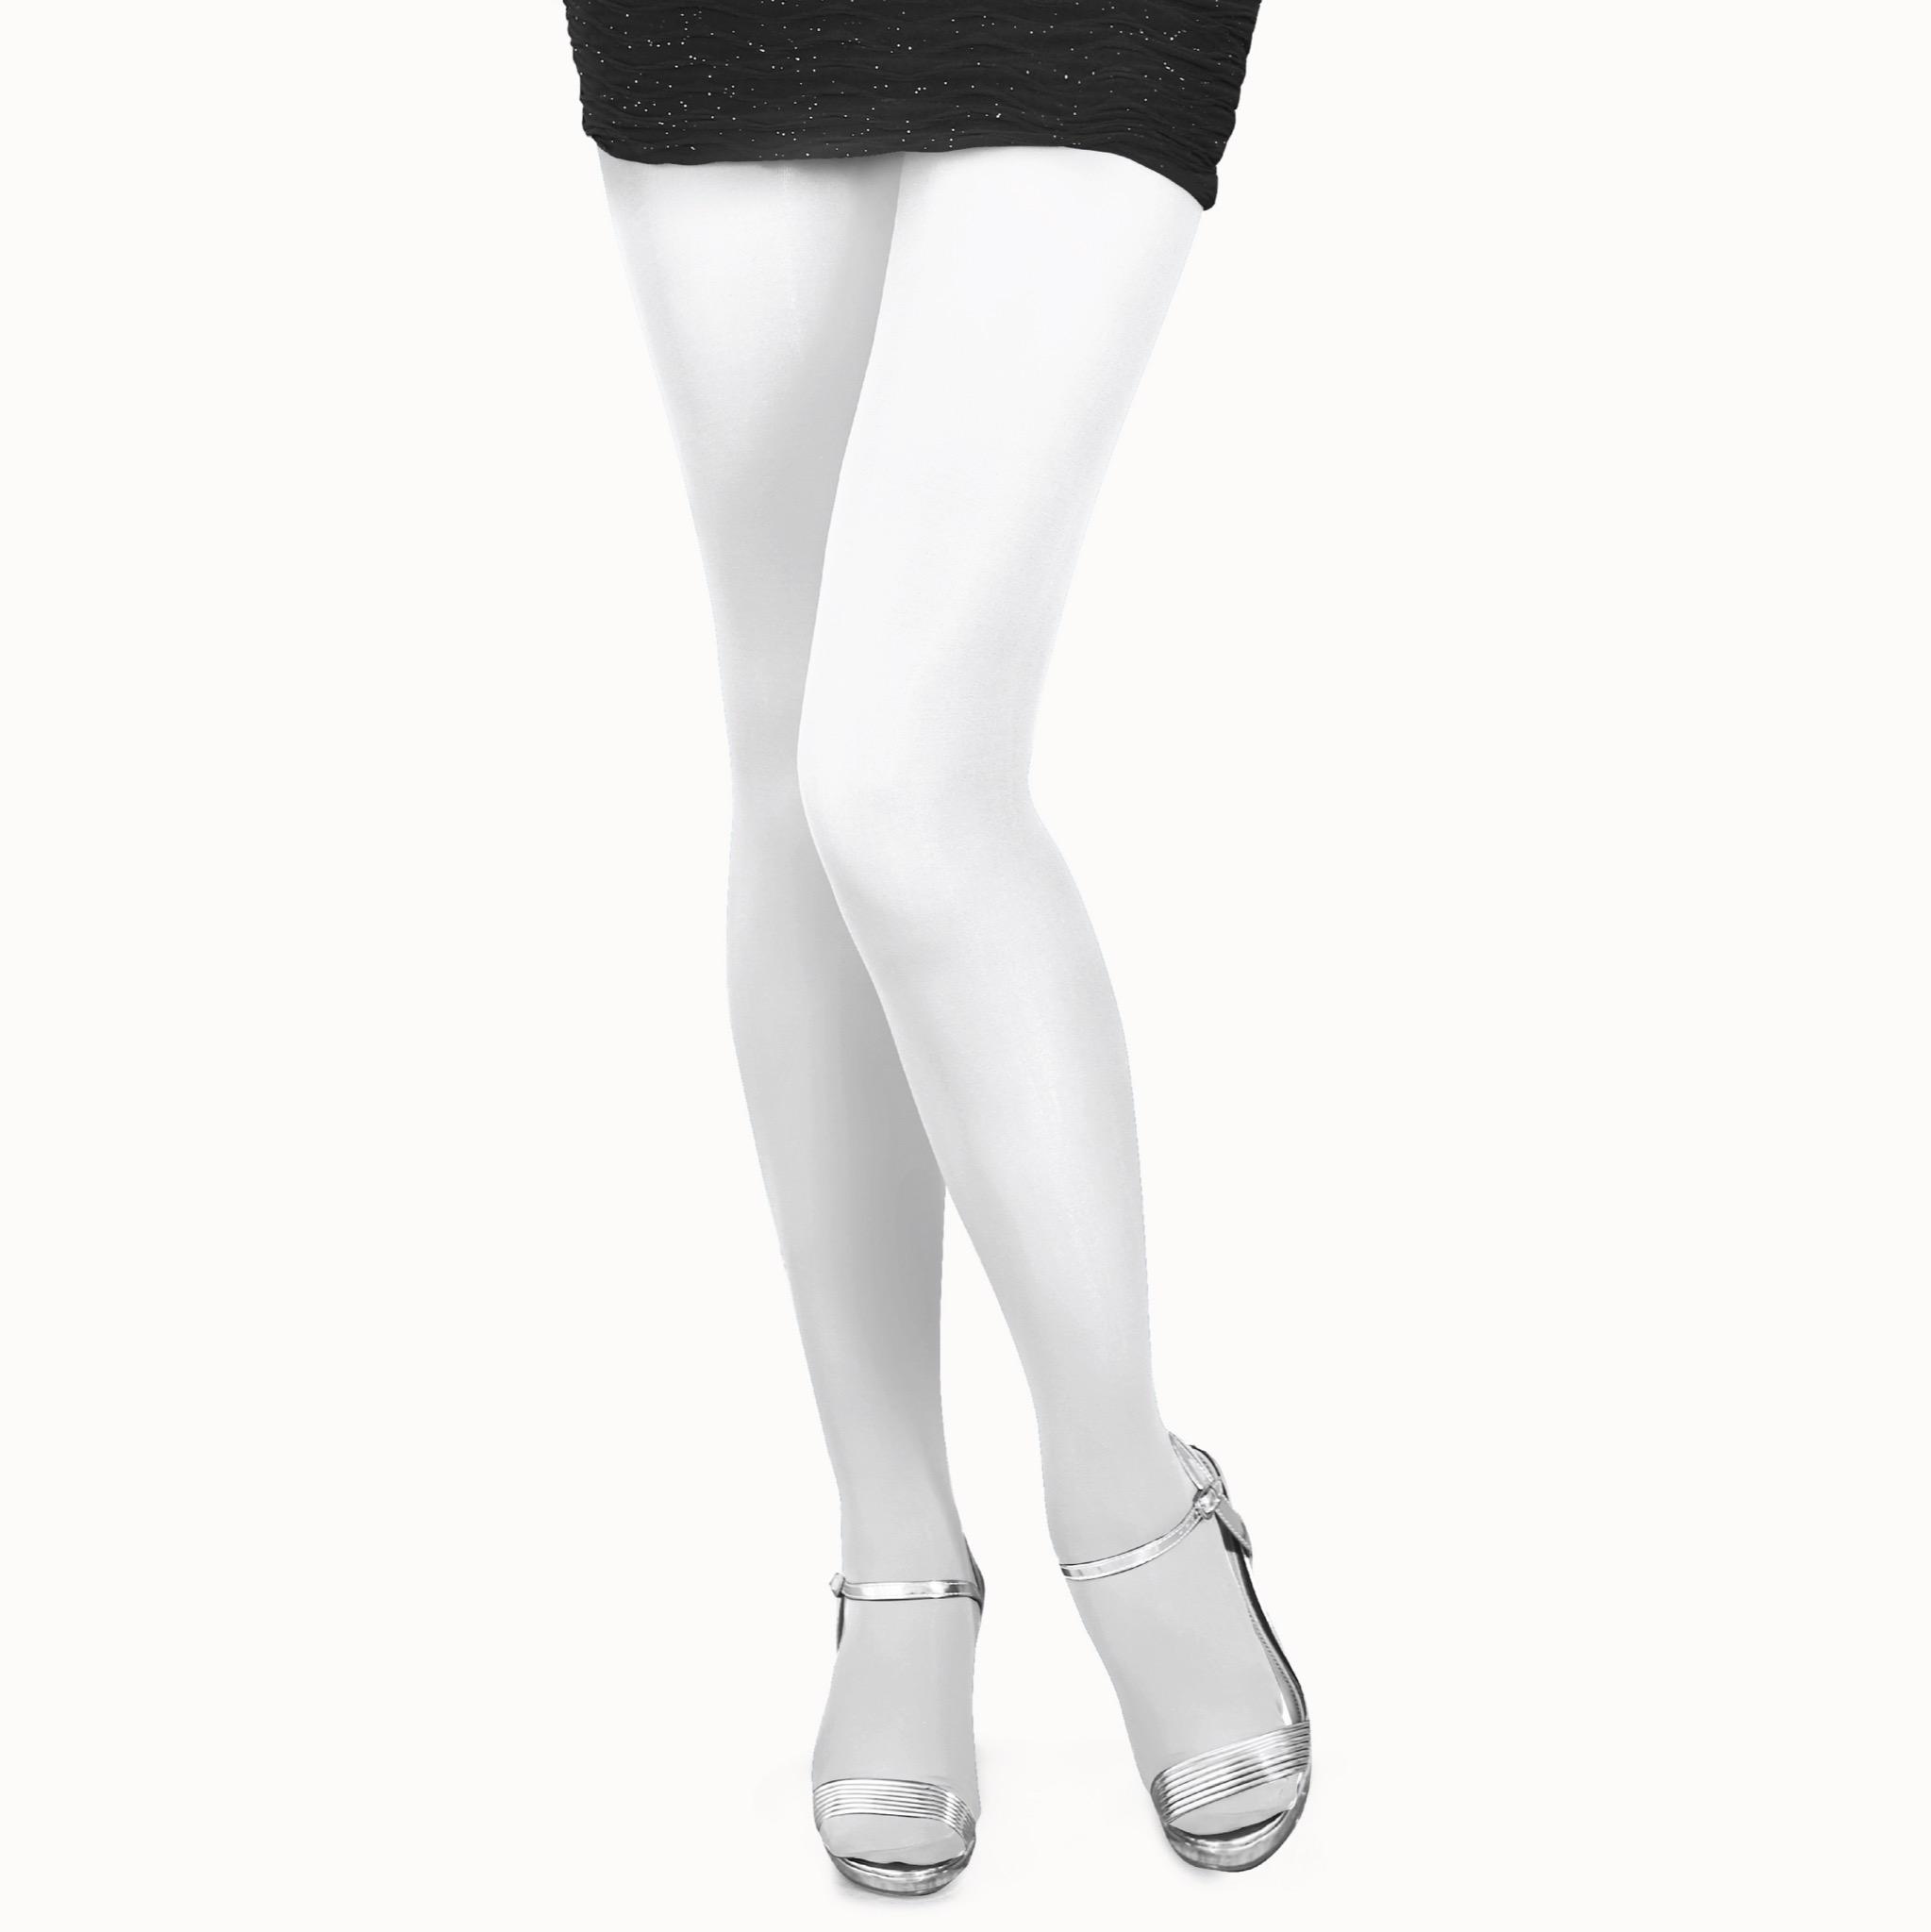 Colorful Legs ถุงน่องเนื้อหนา ZOKKI TIGHTS 70 ดีเนียร์ รหัส COP70 สีขาว